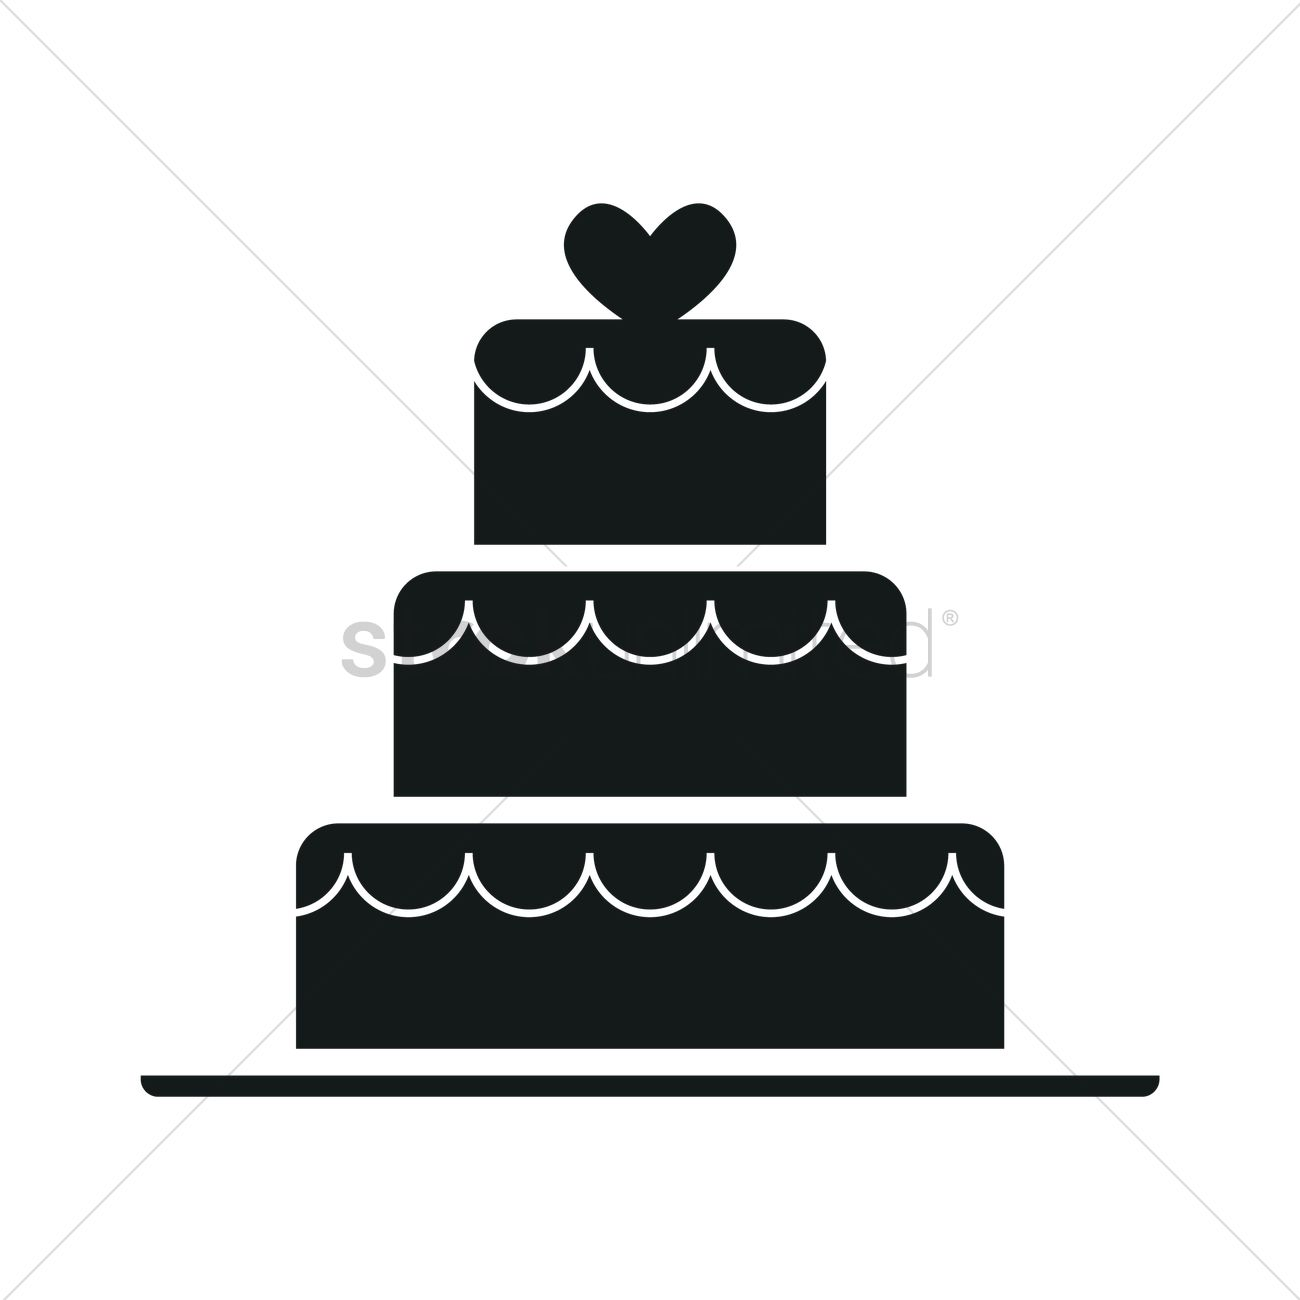 1300x1300 Wedding Cake Silhouette Vector Image